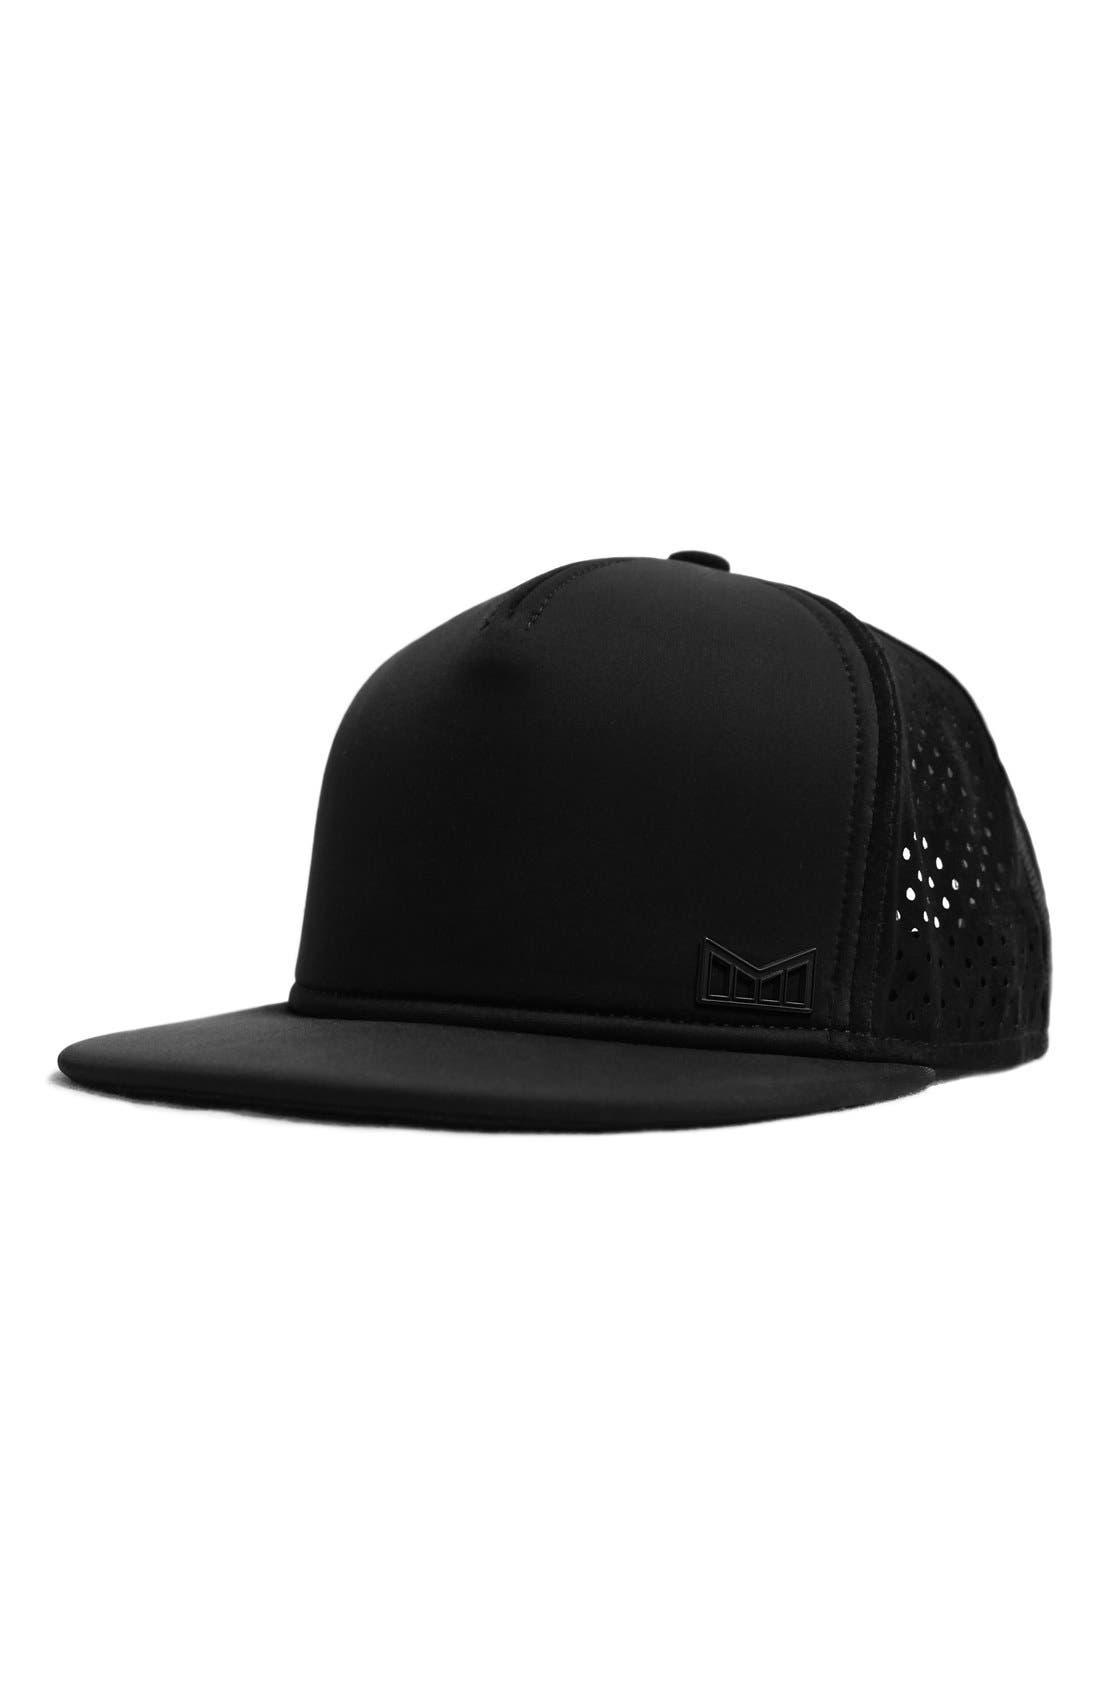 Main Image - Melin 'The Sharpshooter' Snapback Baseball Cap